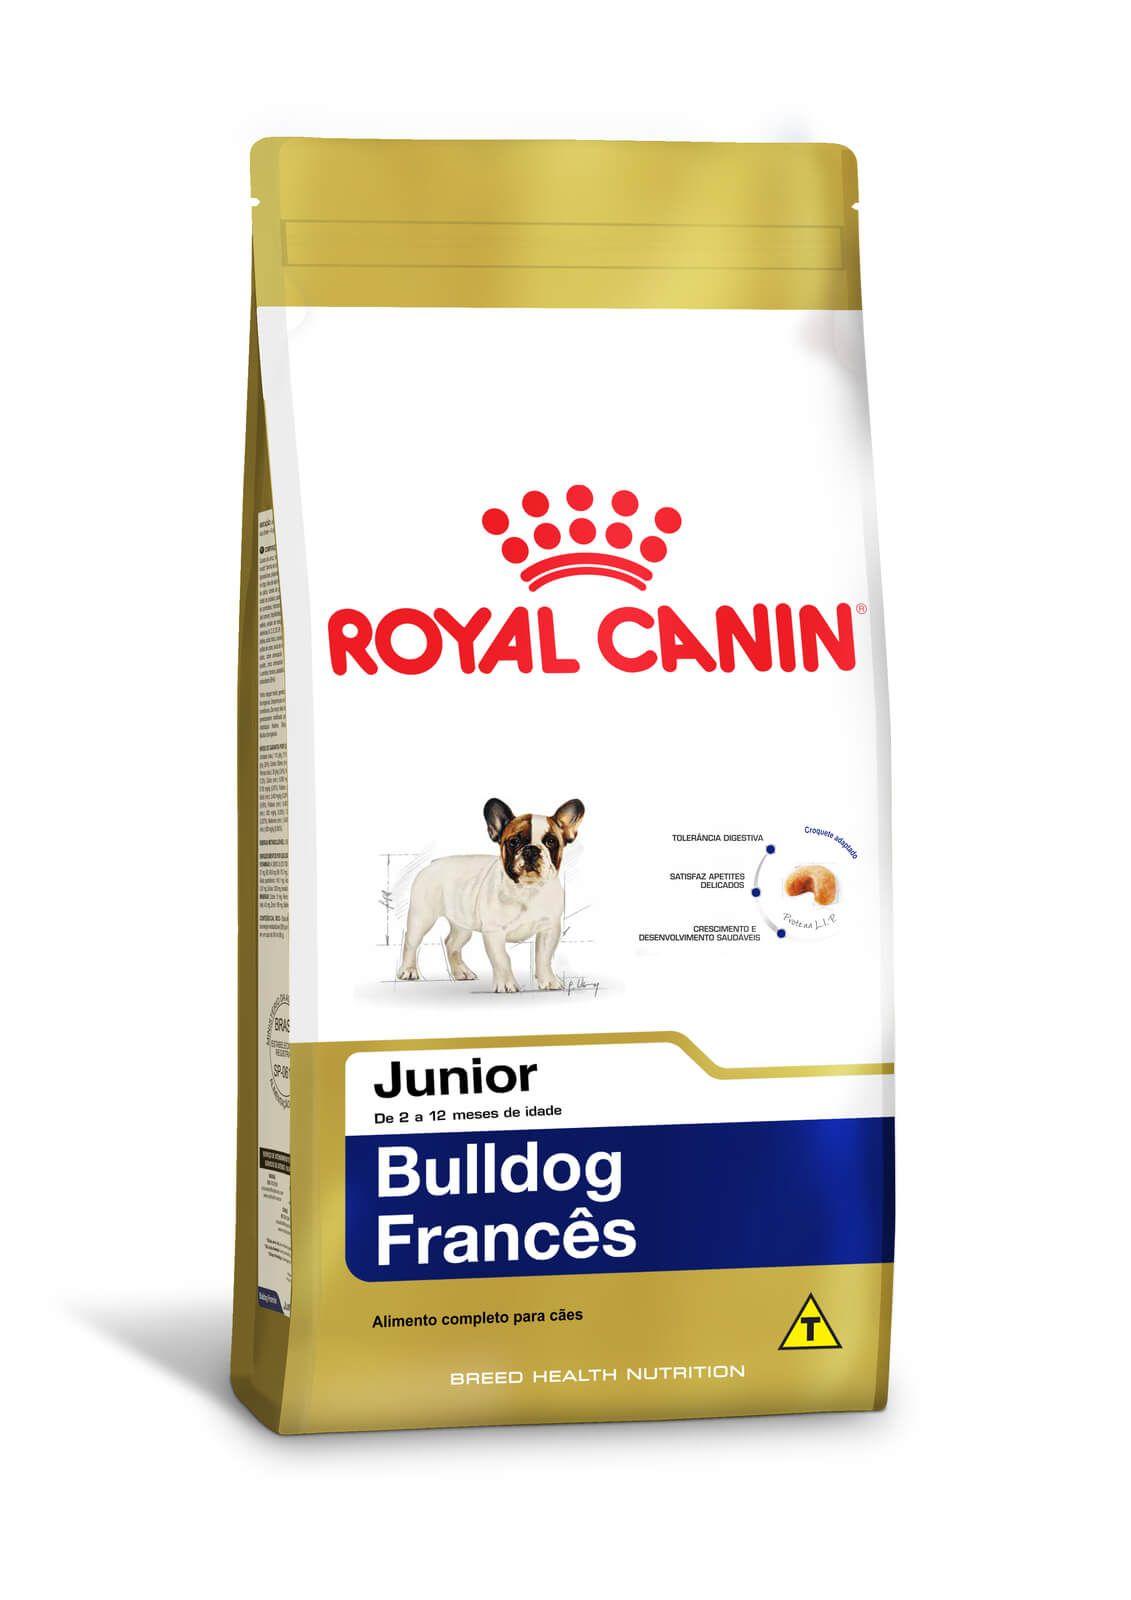 Ração Royal Canin Bulldog Francês Junior 2,5 kg